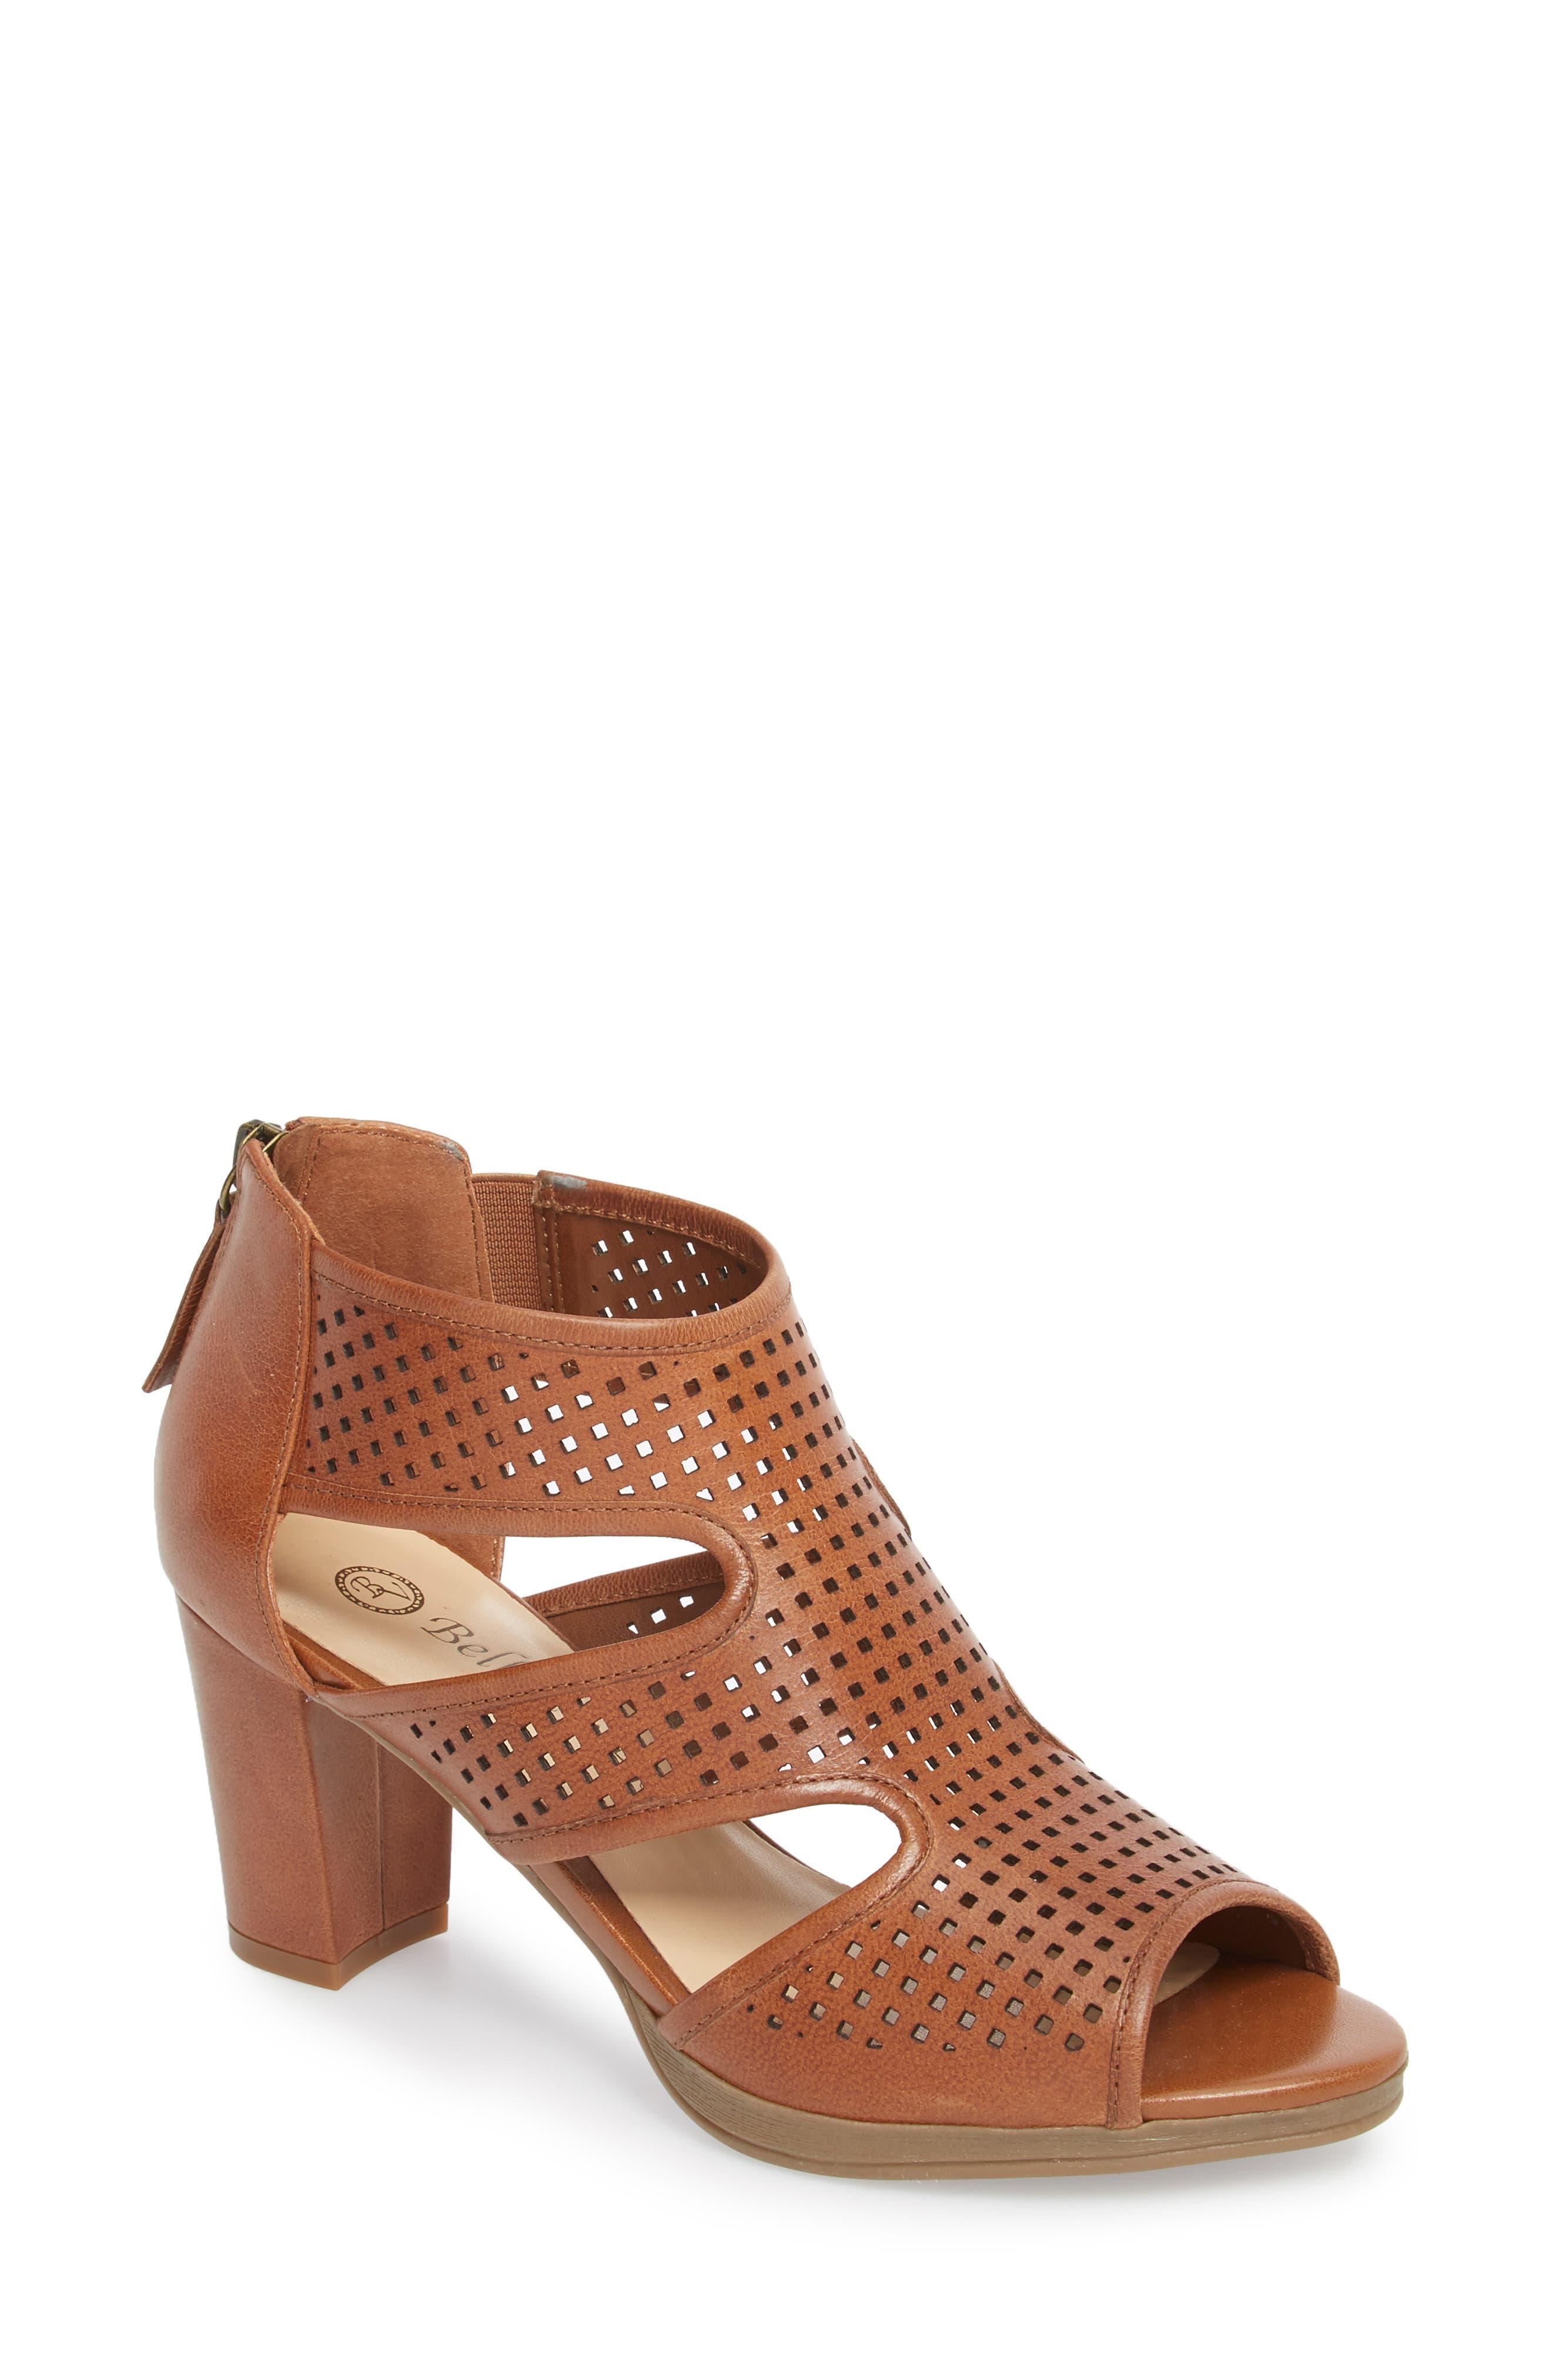 Leslie Sandal,                         Main,                         color, Tan Leather